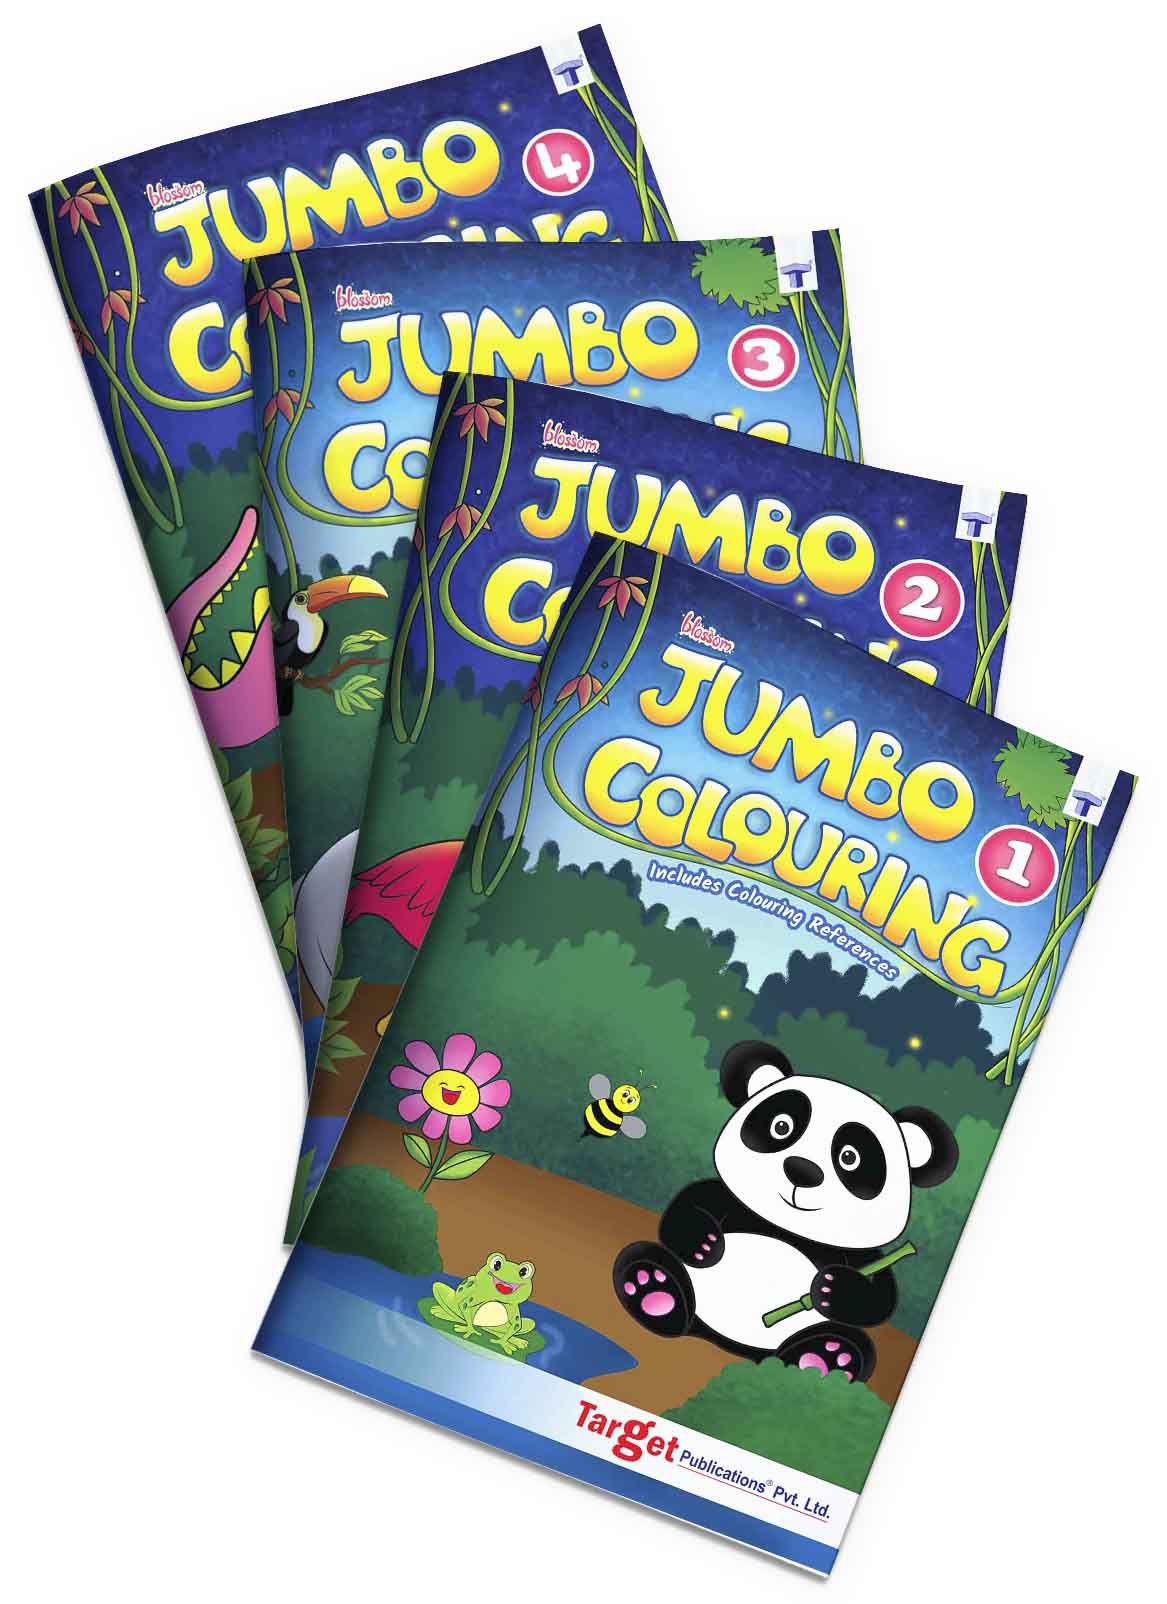 Blossom Jumbo Colouring Books For SDL 1 f1eb0